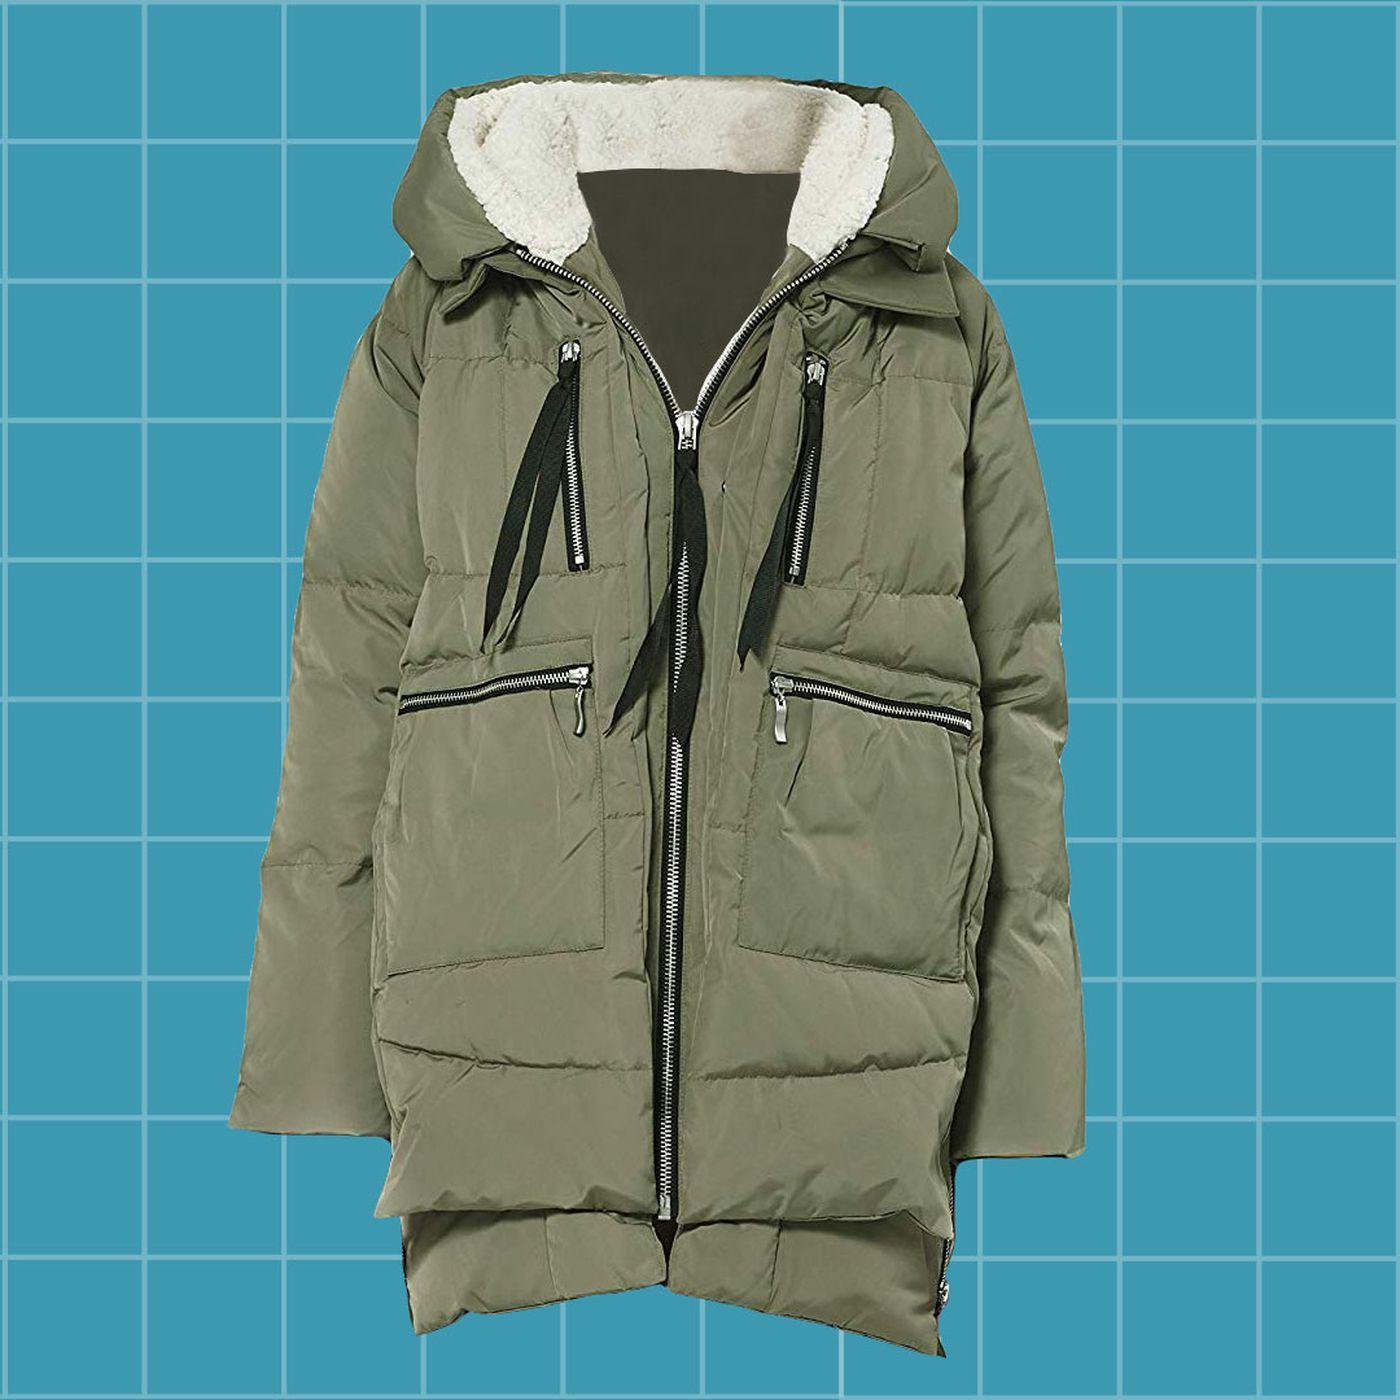 2de8a5158cb0 The Orolay Amazon coat, explained - Vox